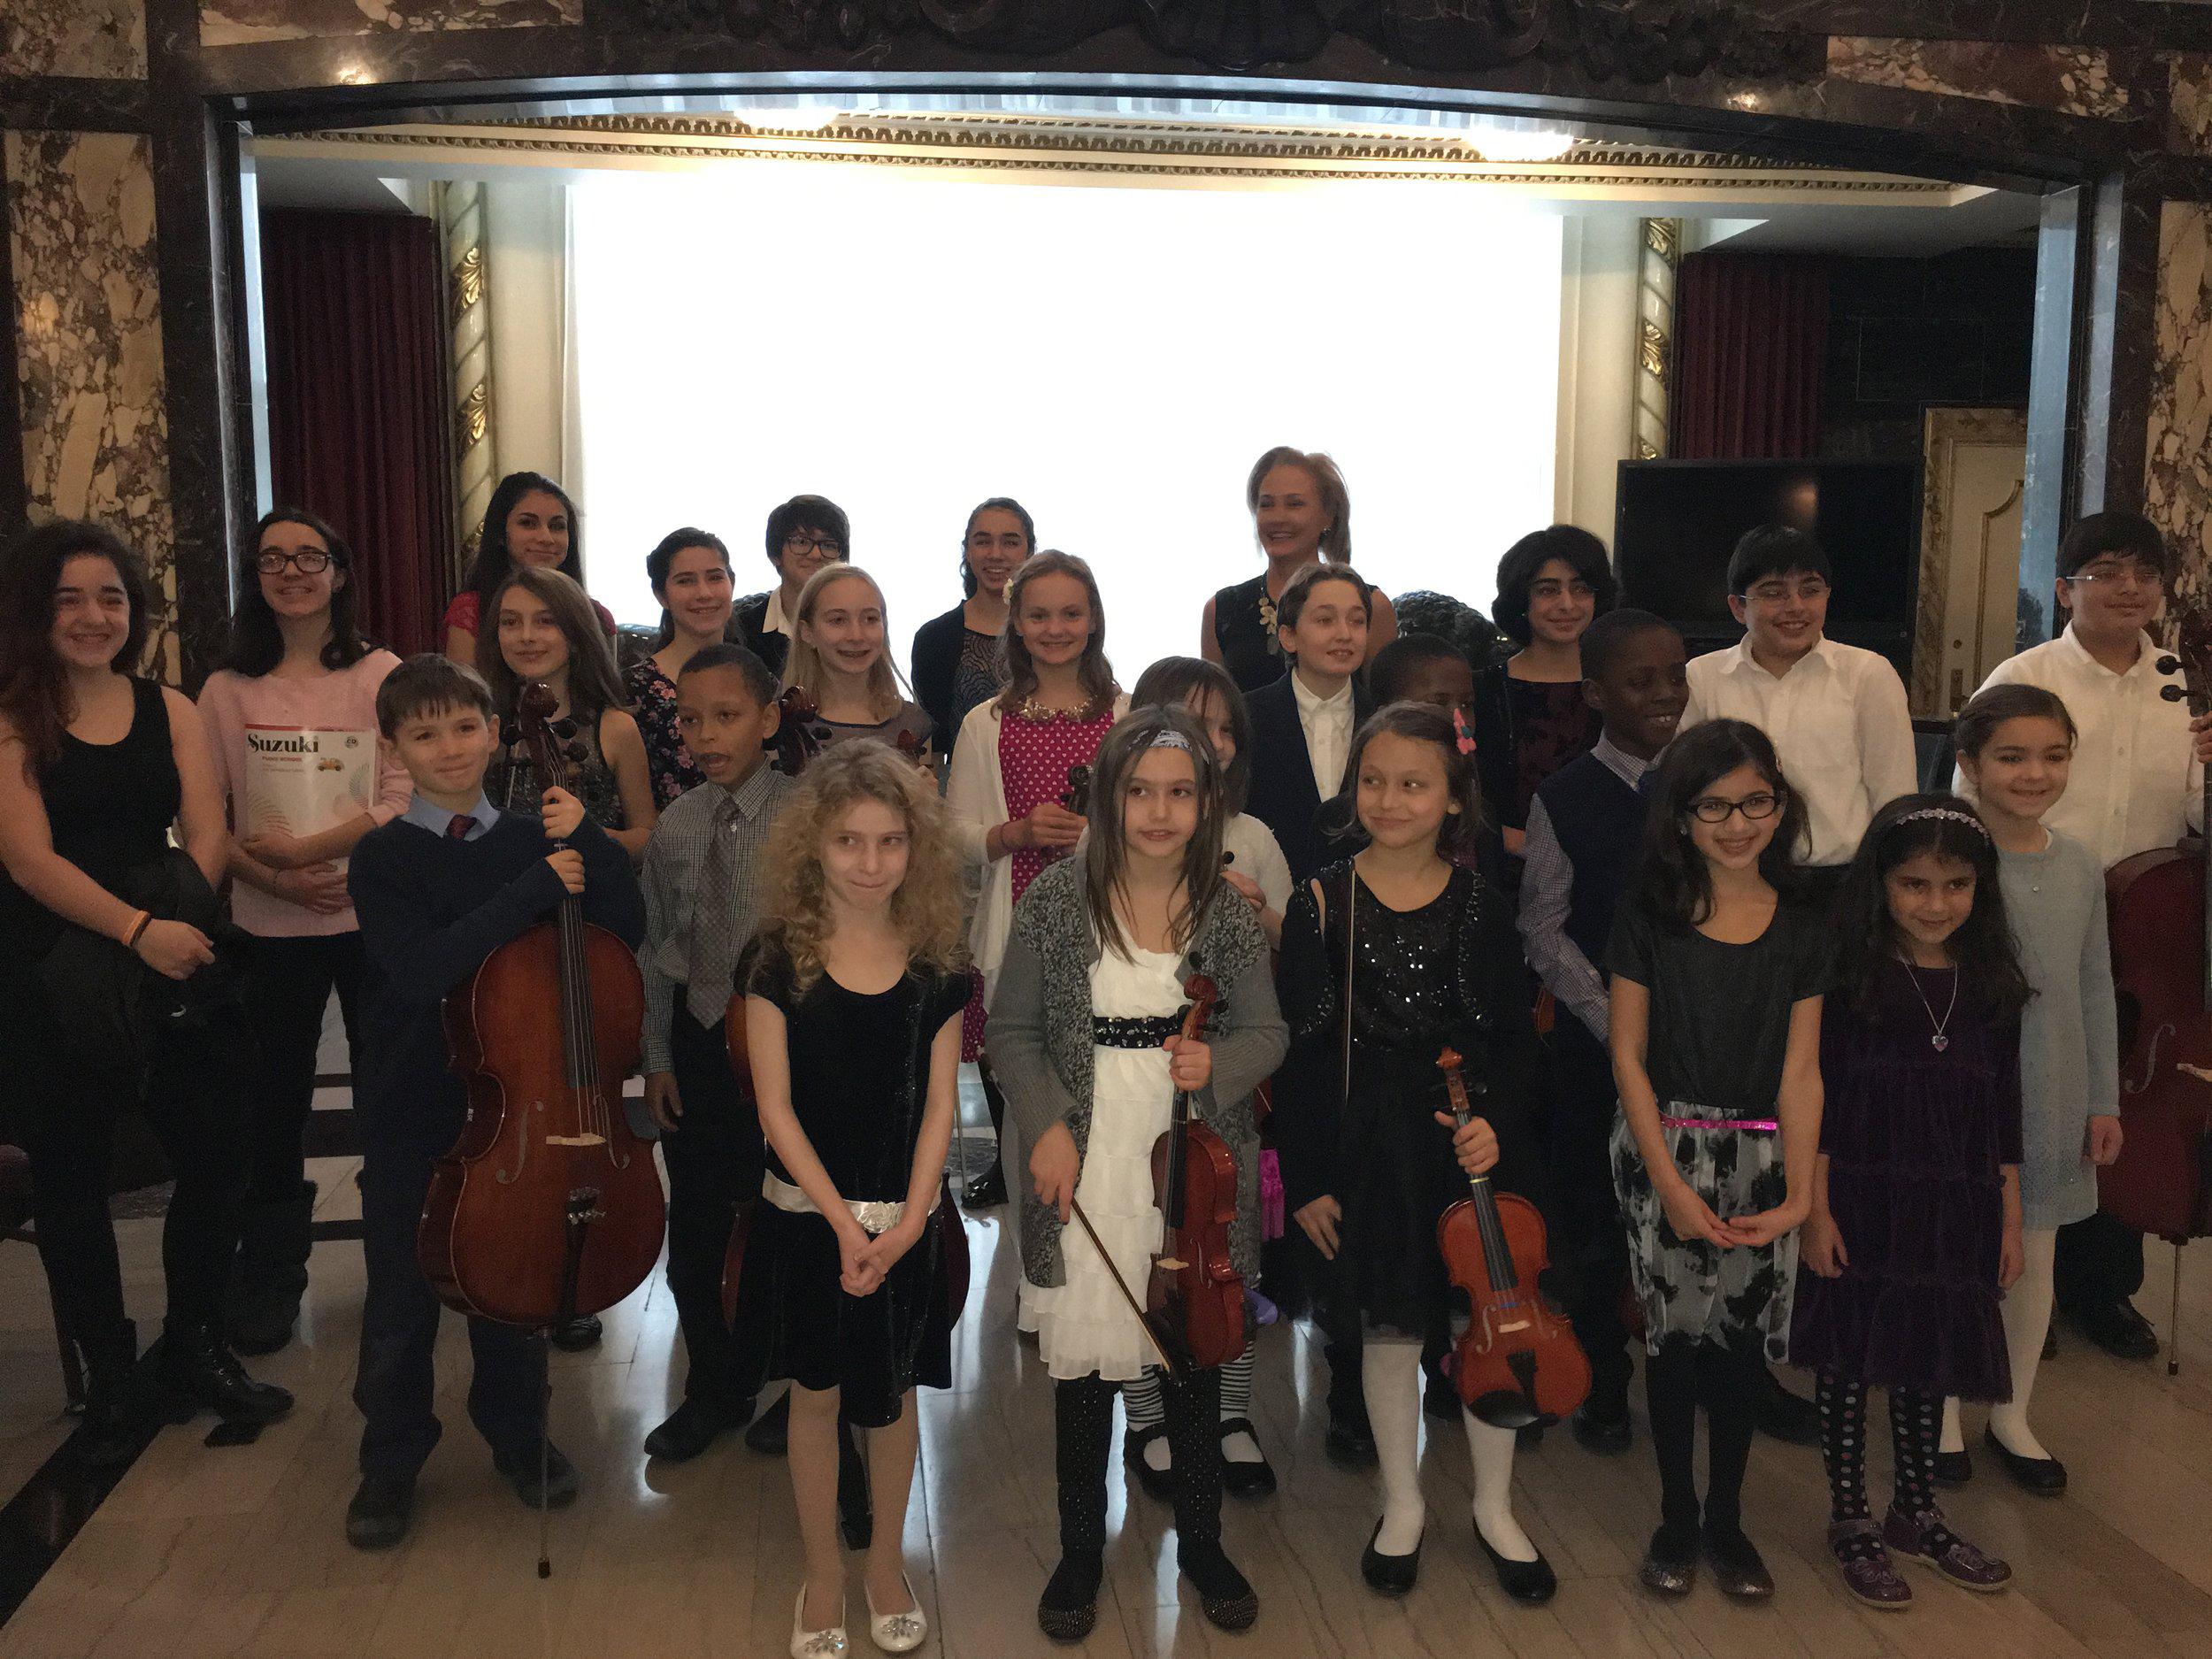 Ms. Galina Studio recital in heinz hall grand lobby, 2016, pittsburgh, pa